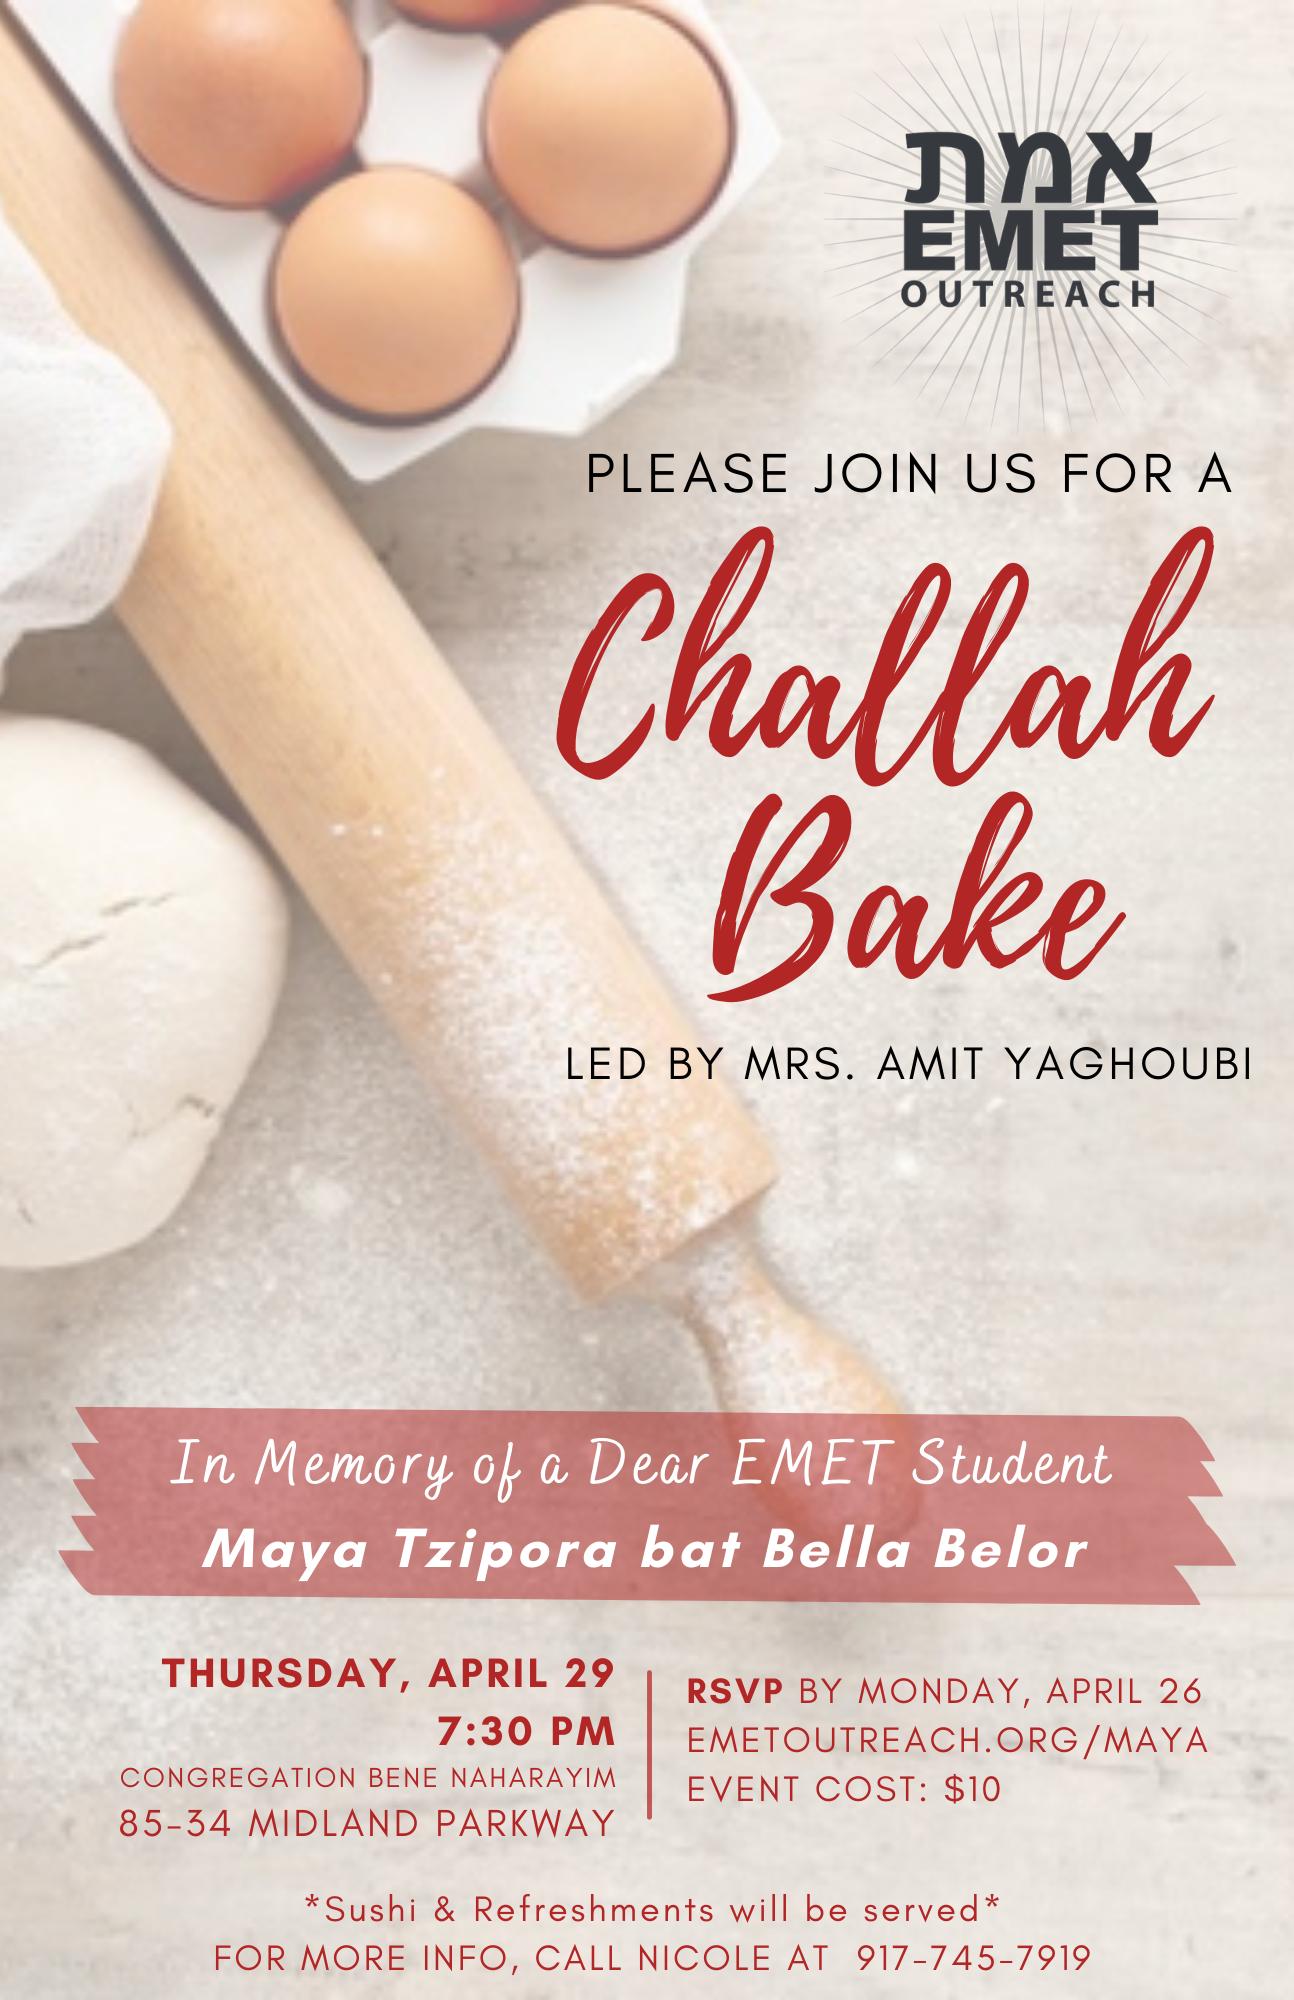 challah bake thursday, april 29 (3)